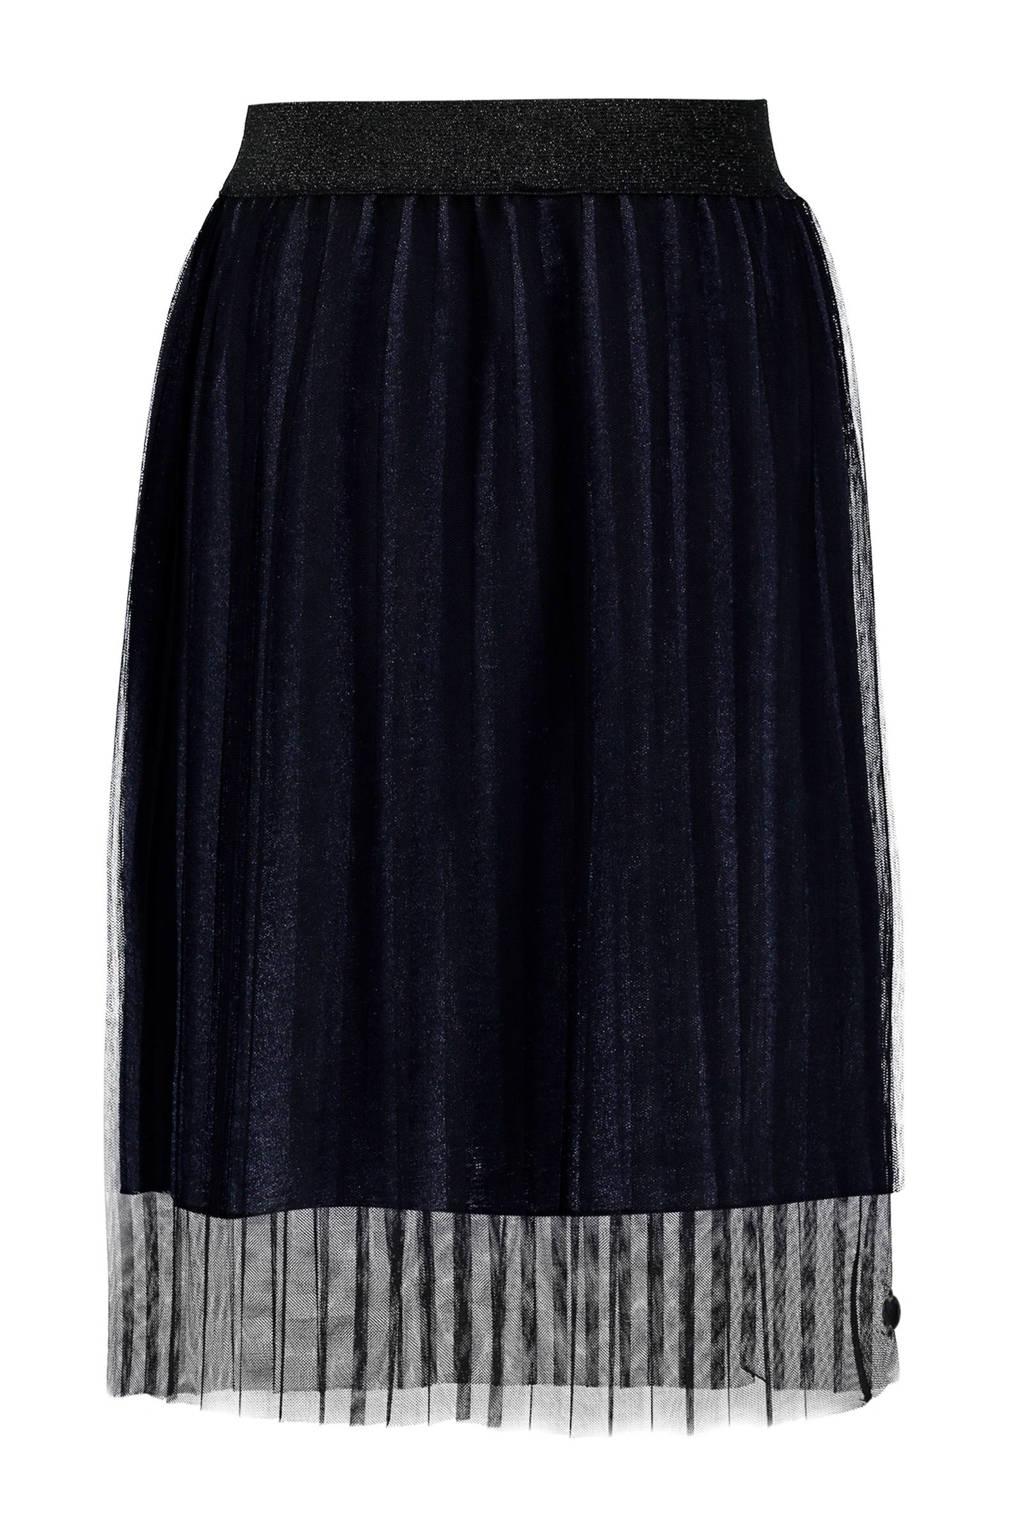 Baker Bridge plissé Sabana rok donkerblauw, Donkerblauw/zwart